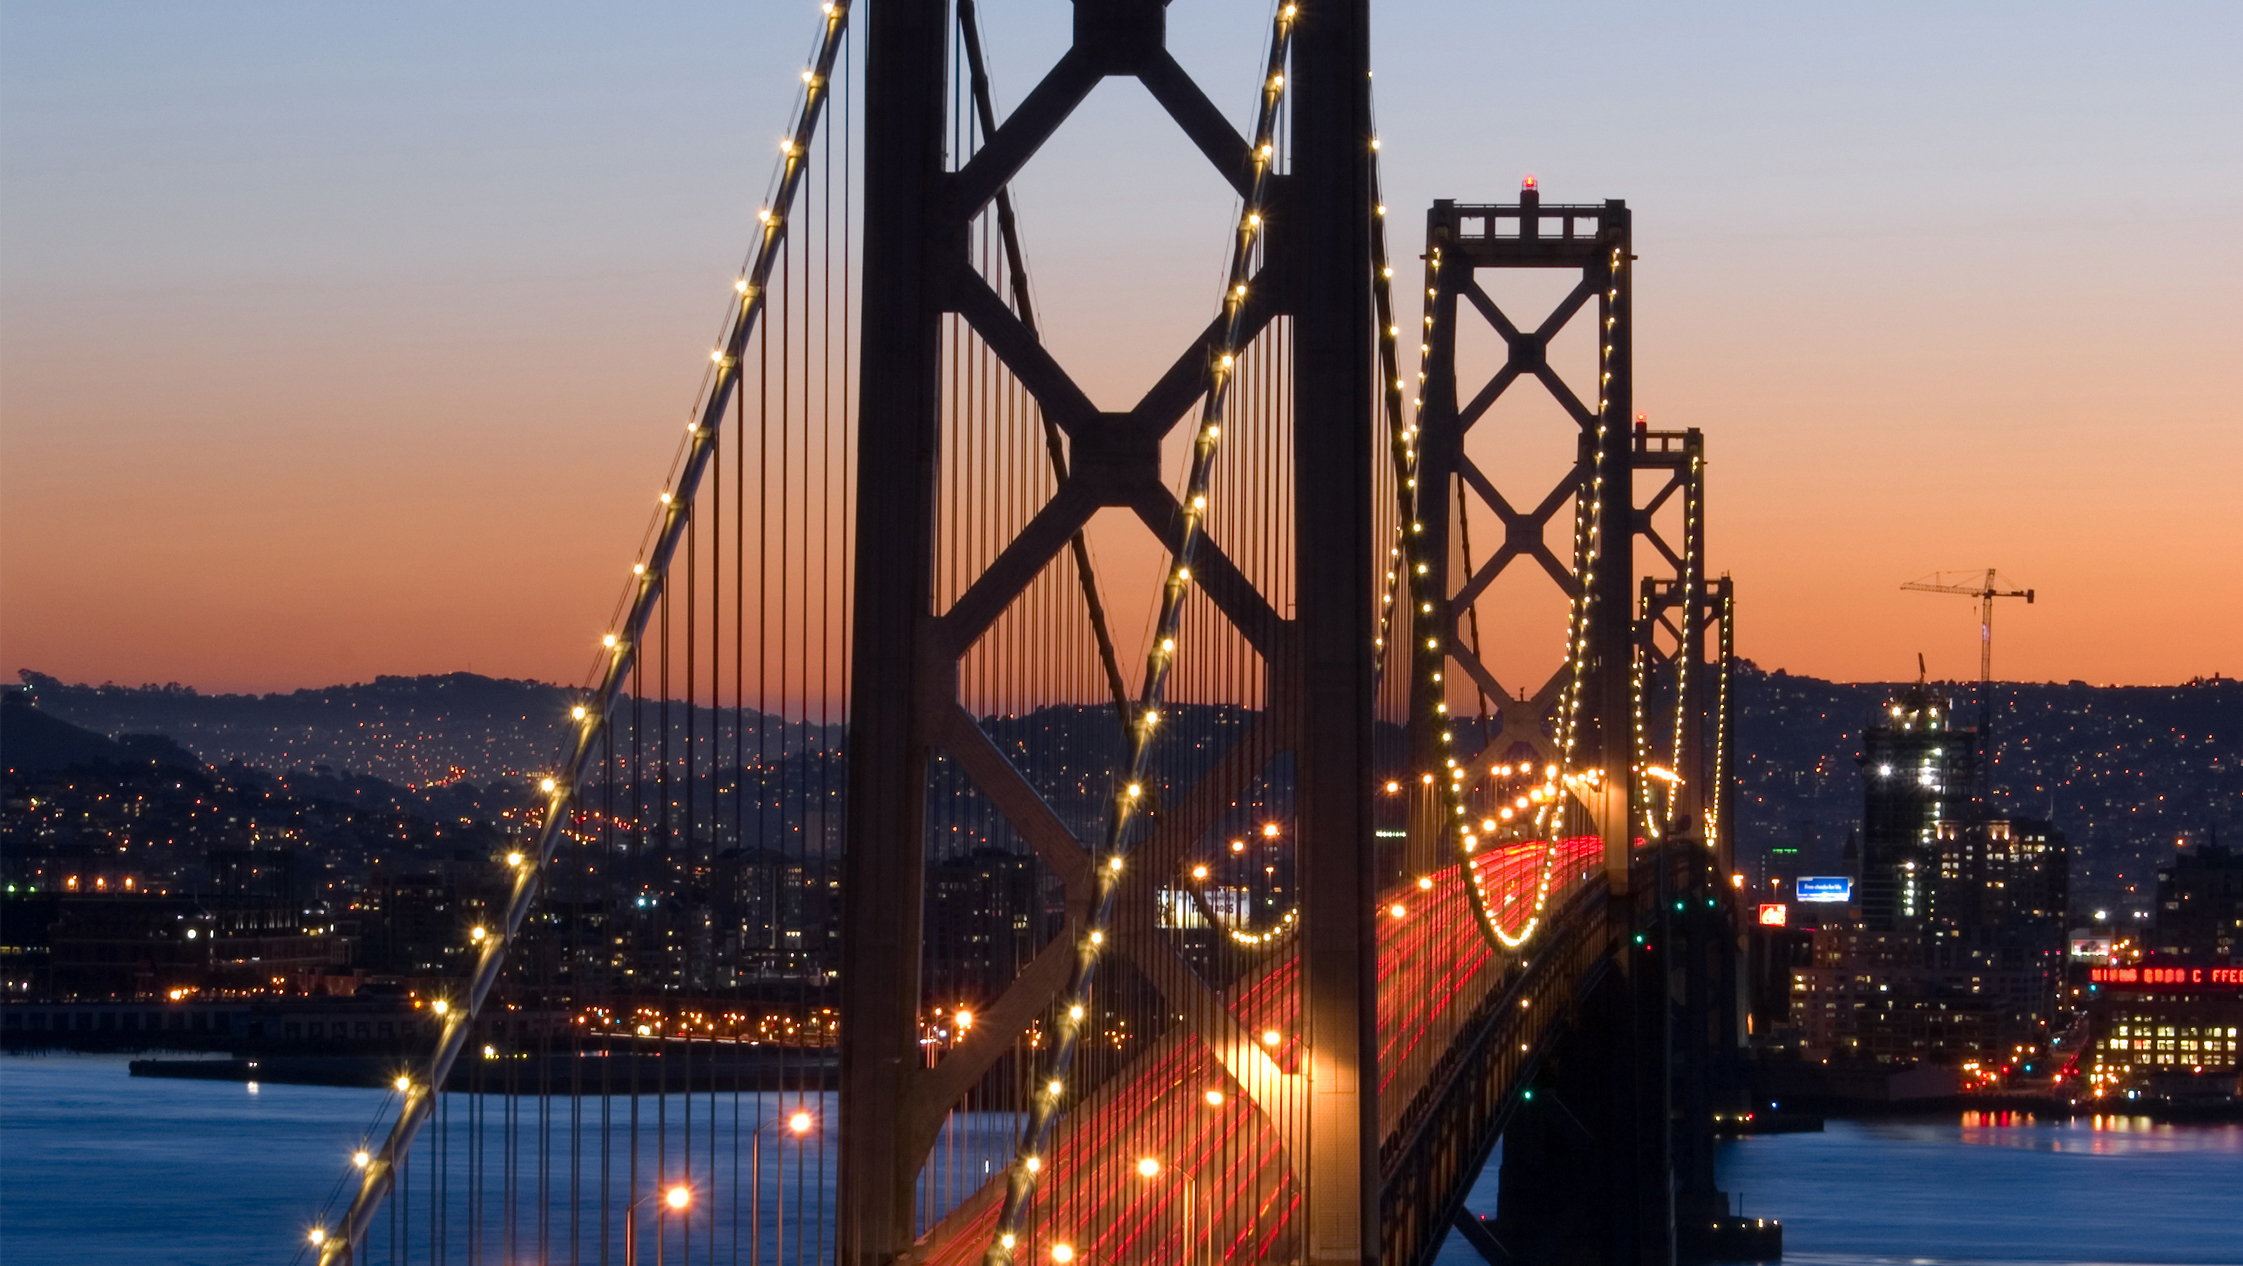 Bay Bridge, San Francisco at dusk